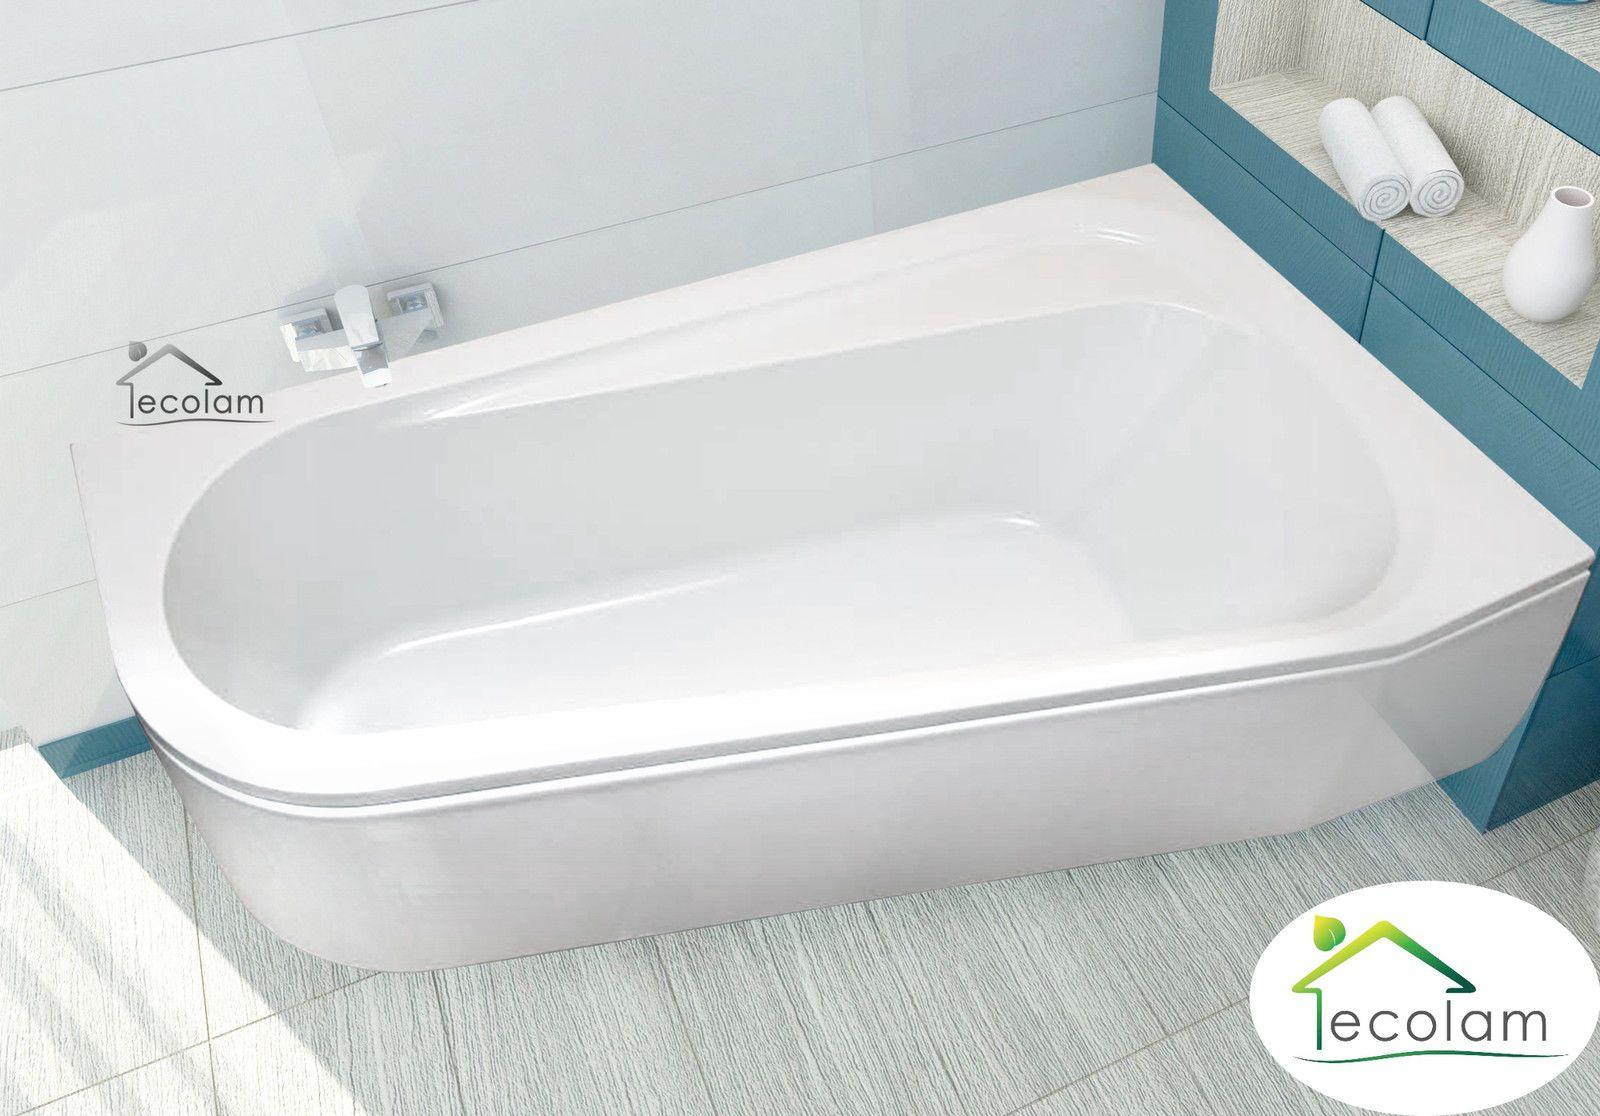 Badewanne Eckwanne Dida 165x95 Cm Rechts Badewanne Badewanne Ideen Duschwanne